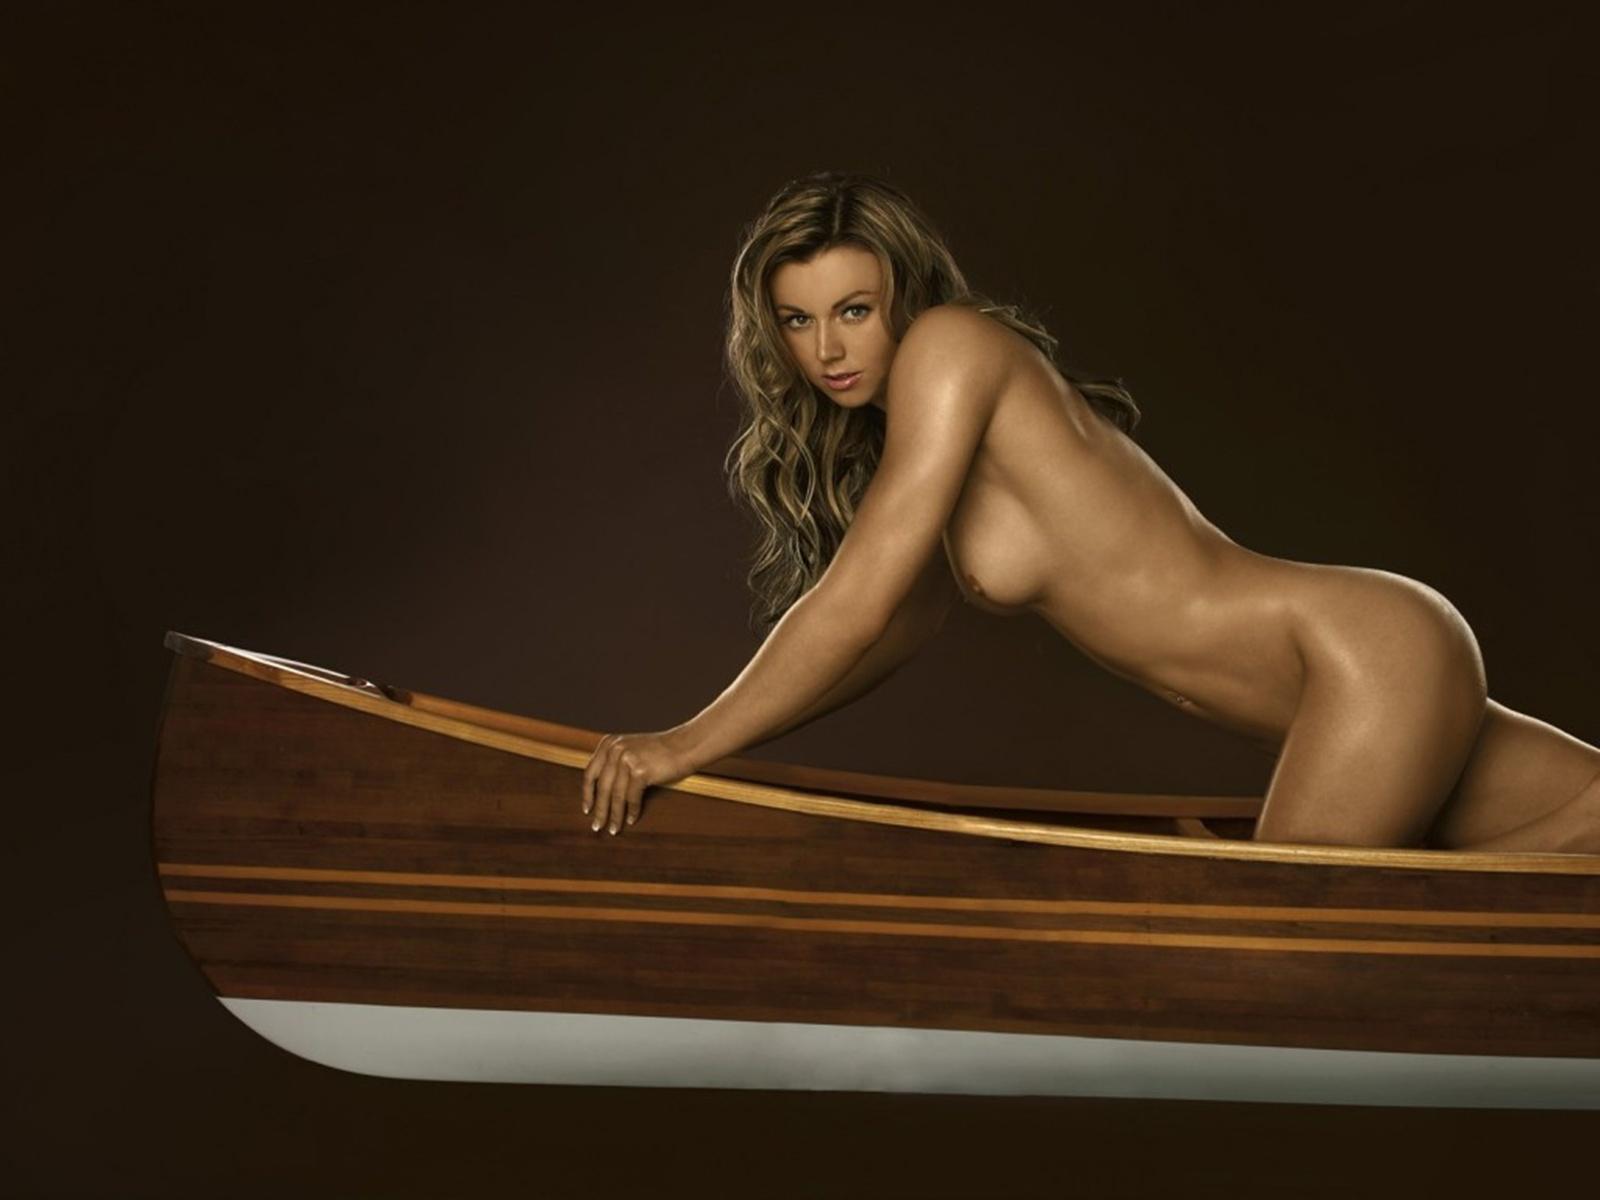 Nicole-Reinhardt-German-Olympians-Nude-For-Playboy-1.jpg